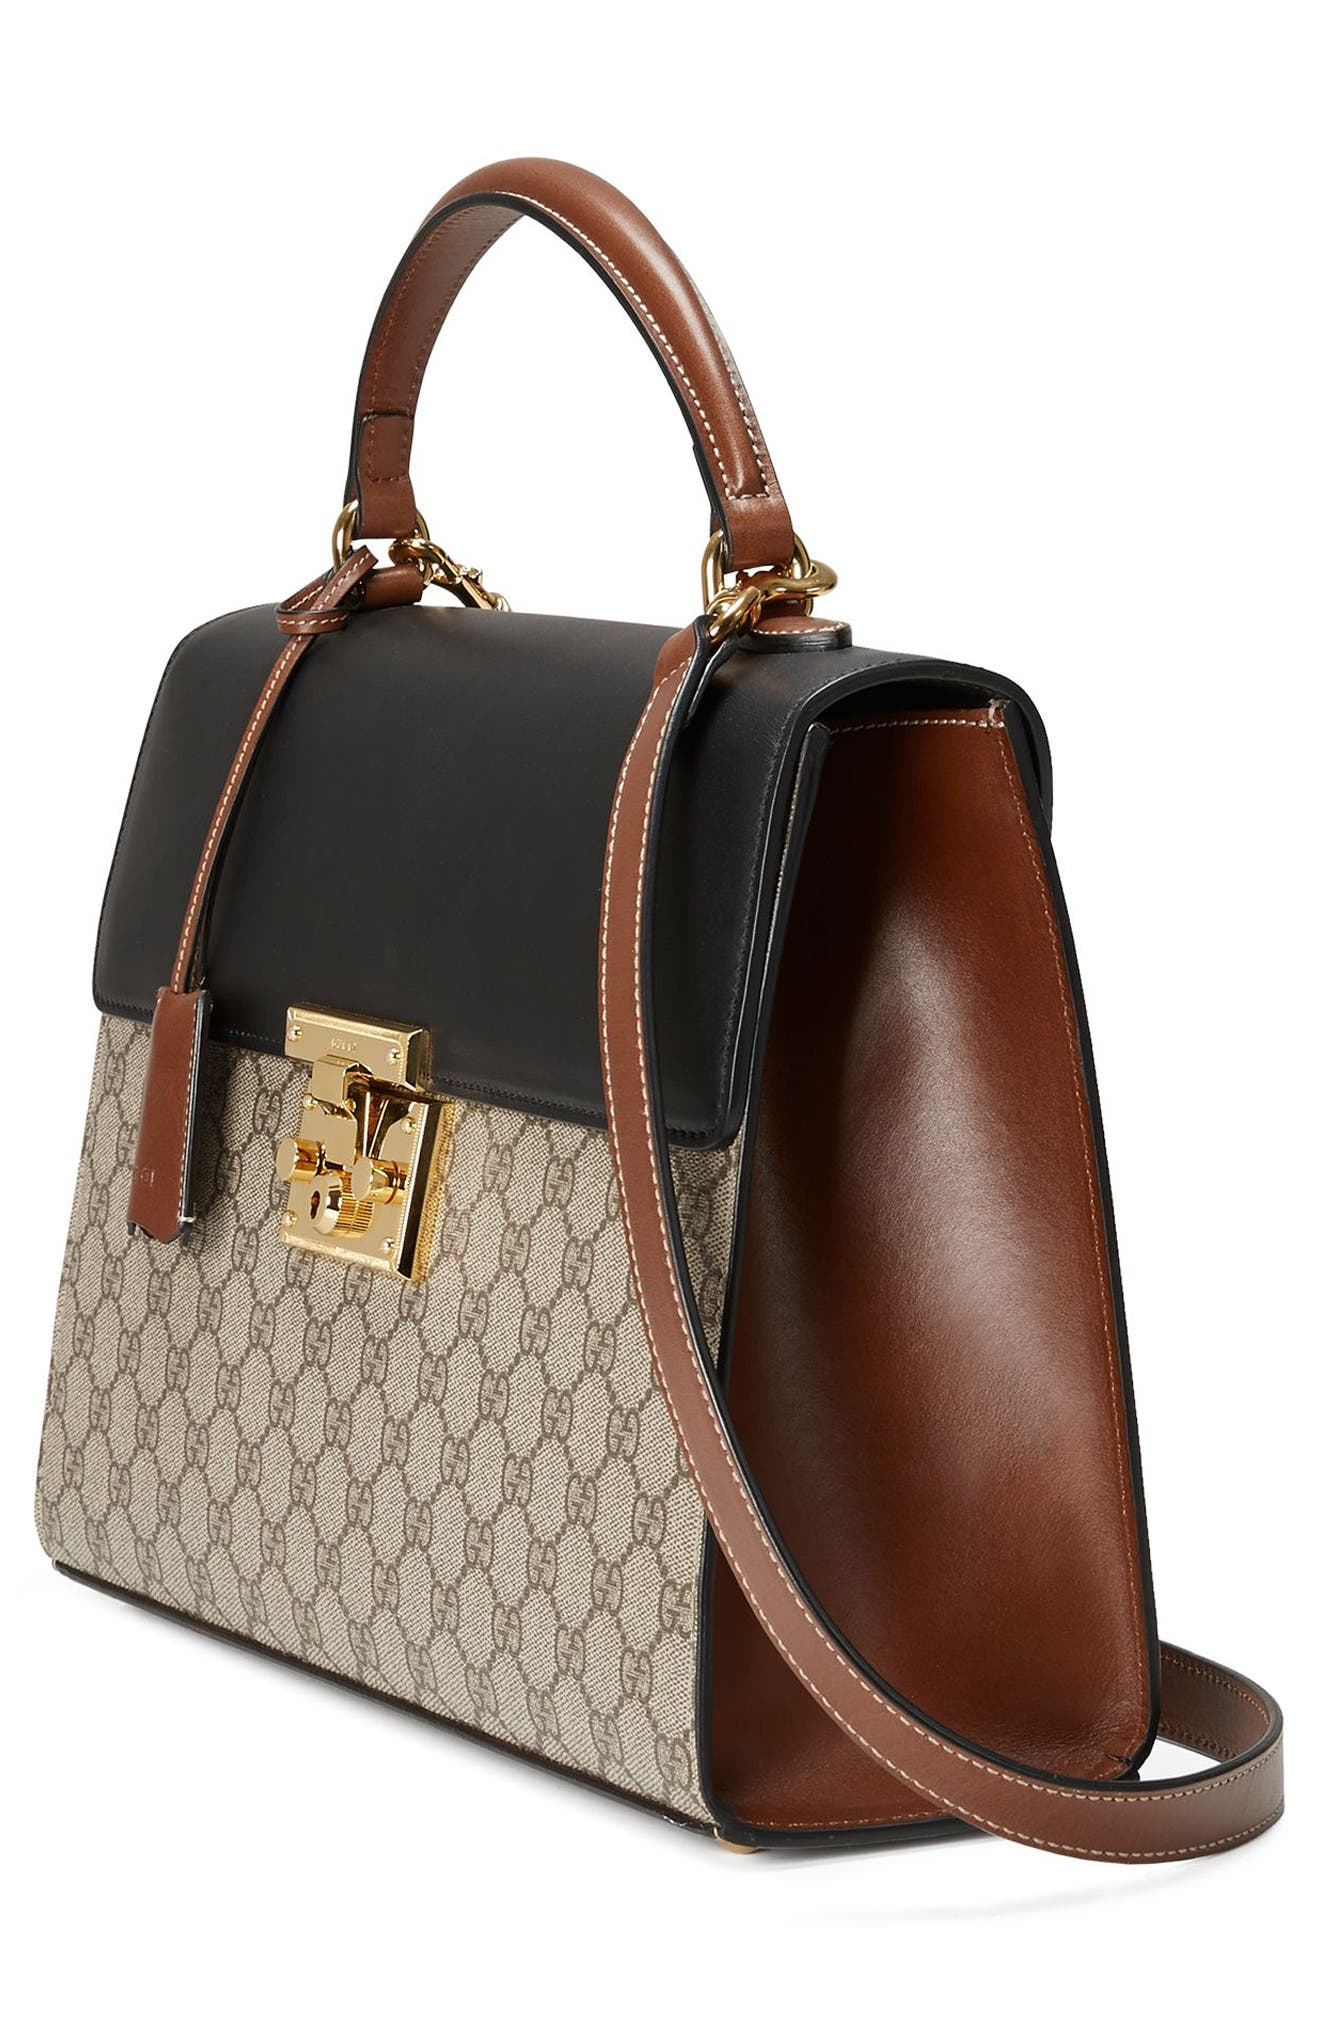 Medium Padlock Top Handle GG Supreme Canvas & Leather Bag,                             Alternate thumbnail 4, color,                             964